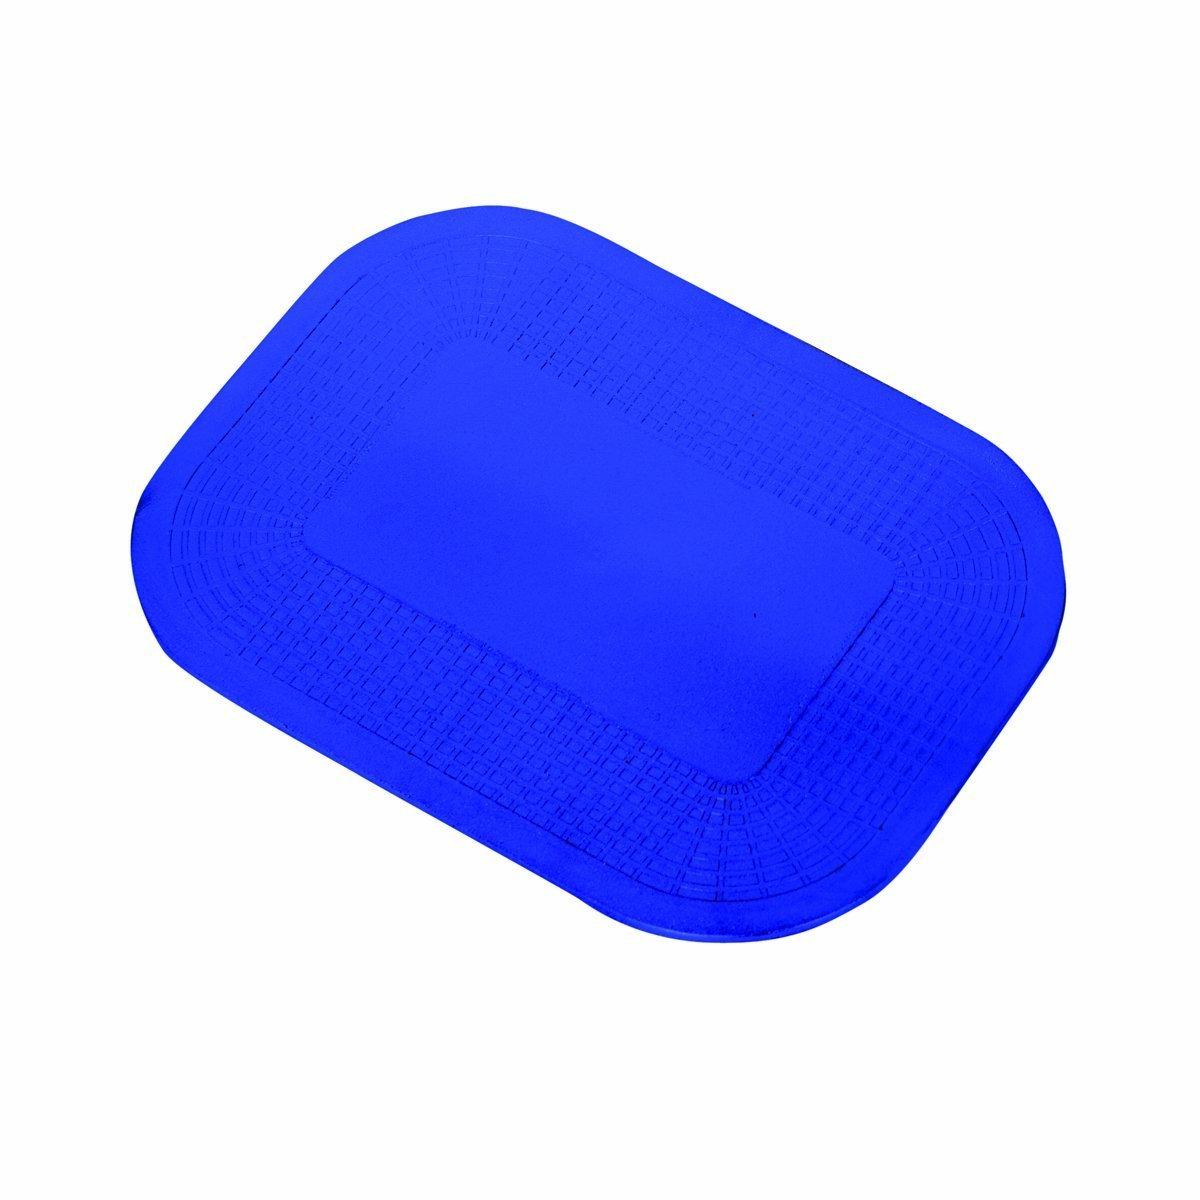 Dycem Pads Activity Pads Dycem Pads Color: Blue Size: 18'' x 15'' x 1/8'' - Model 6621 by Dycem